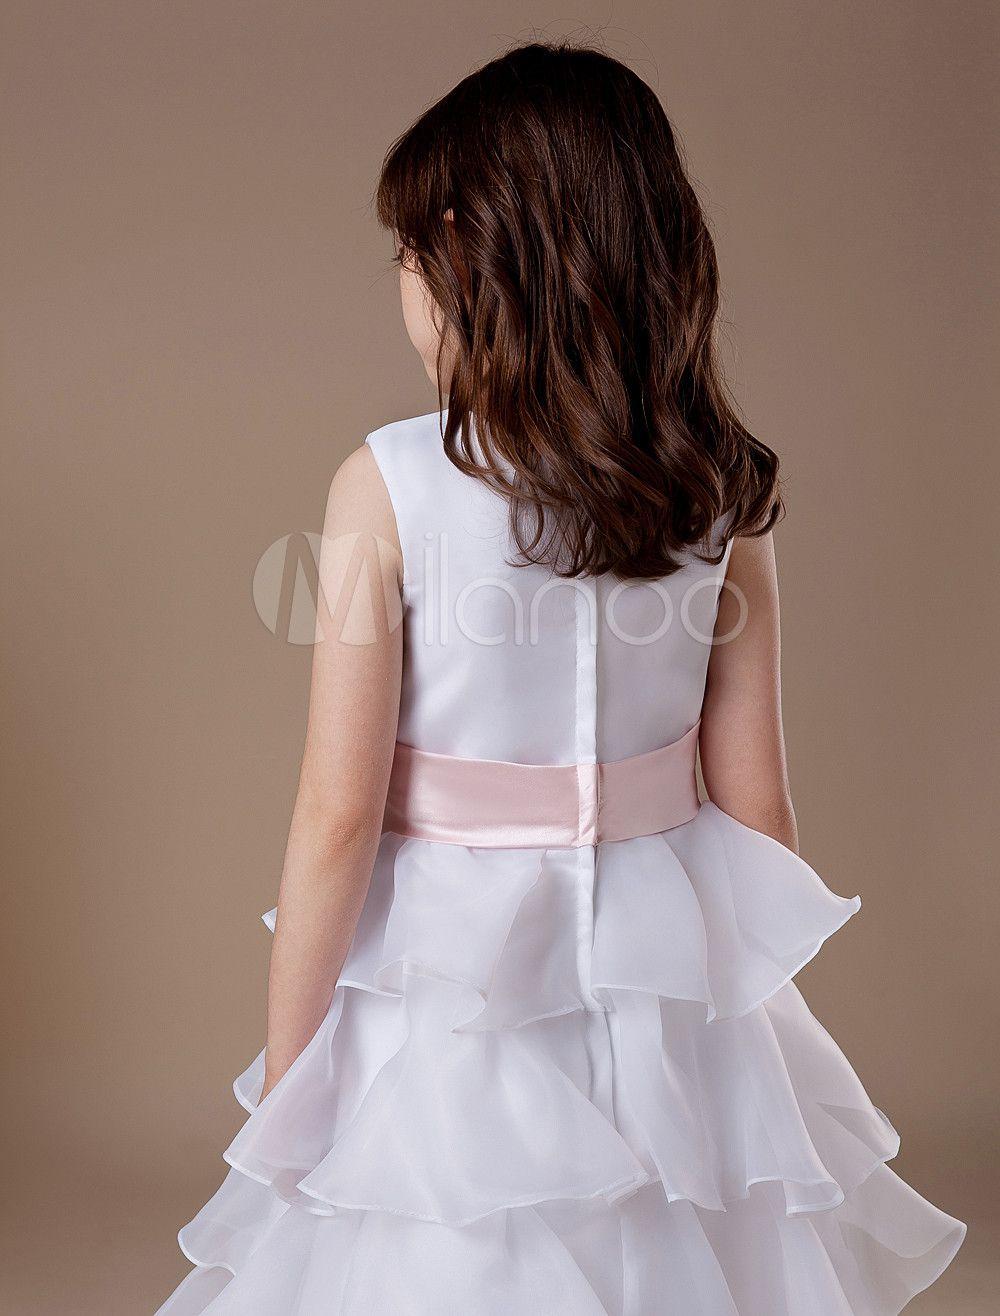 d4136f95dac White Flower Girl Dress Boho Tiered Sleeveless Sash Bow Satin Kids Maxi  Dresses  Dress